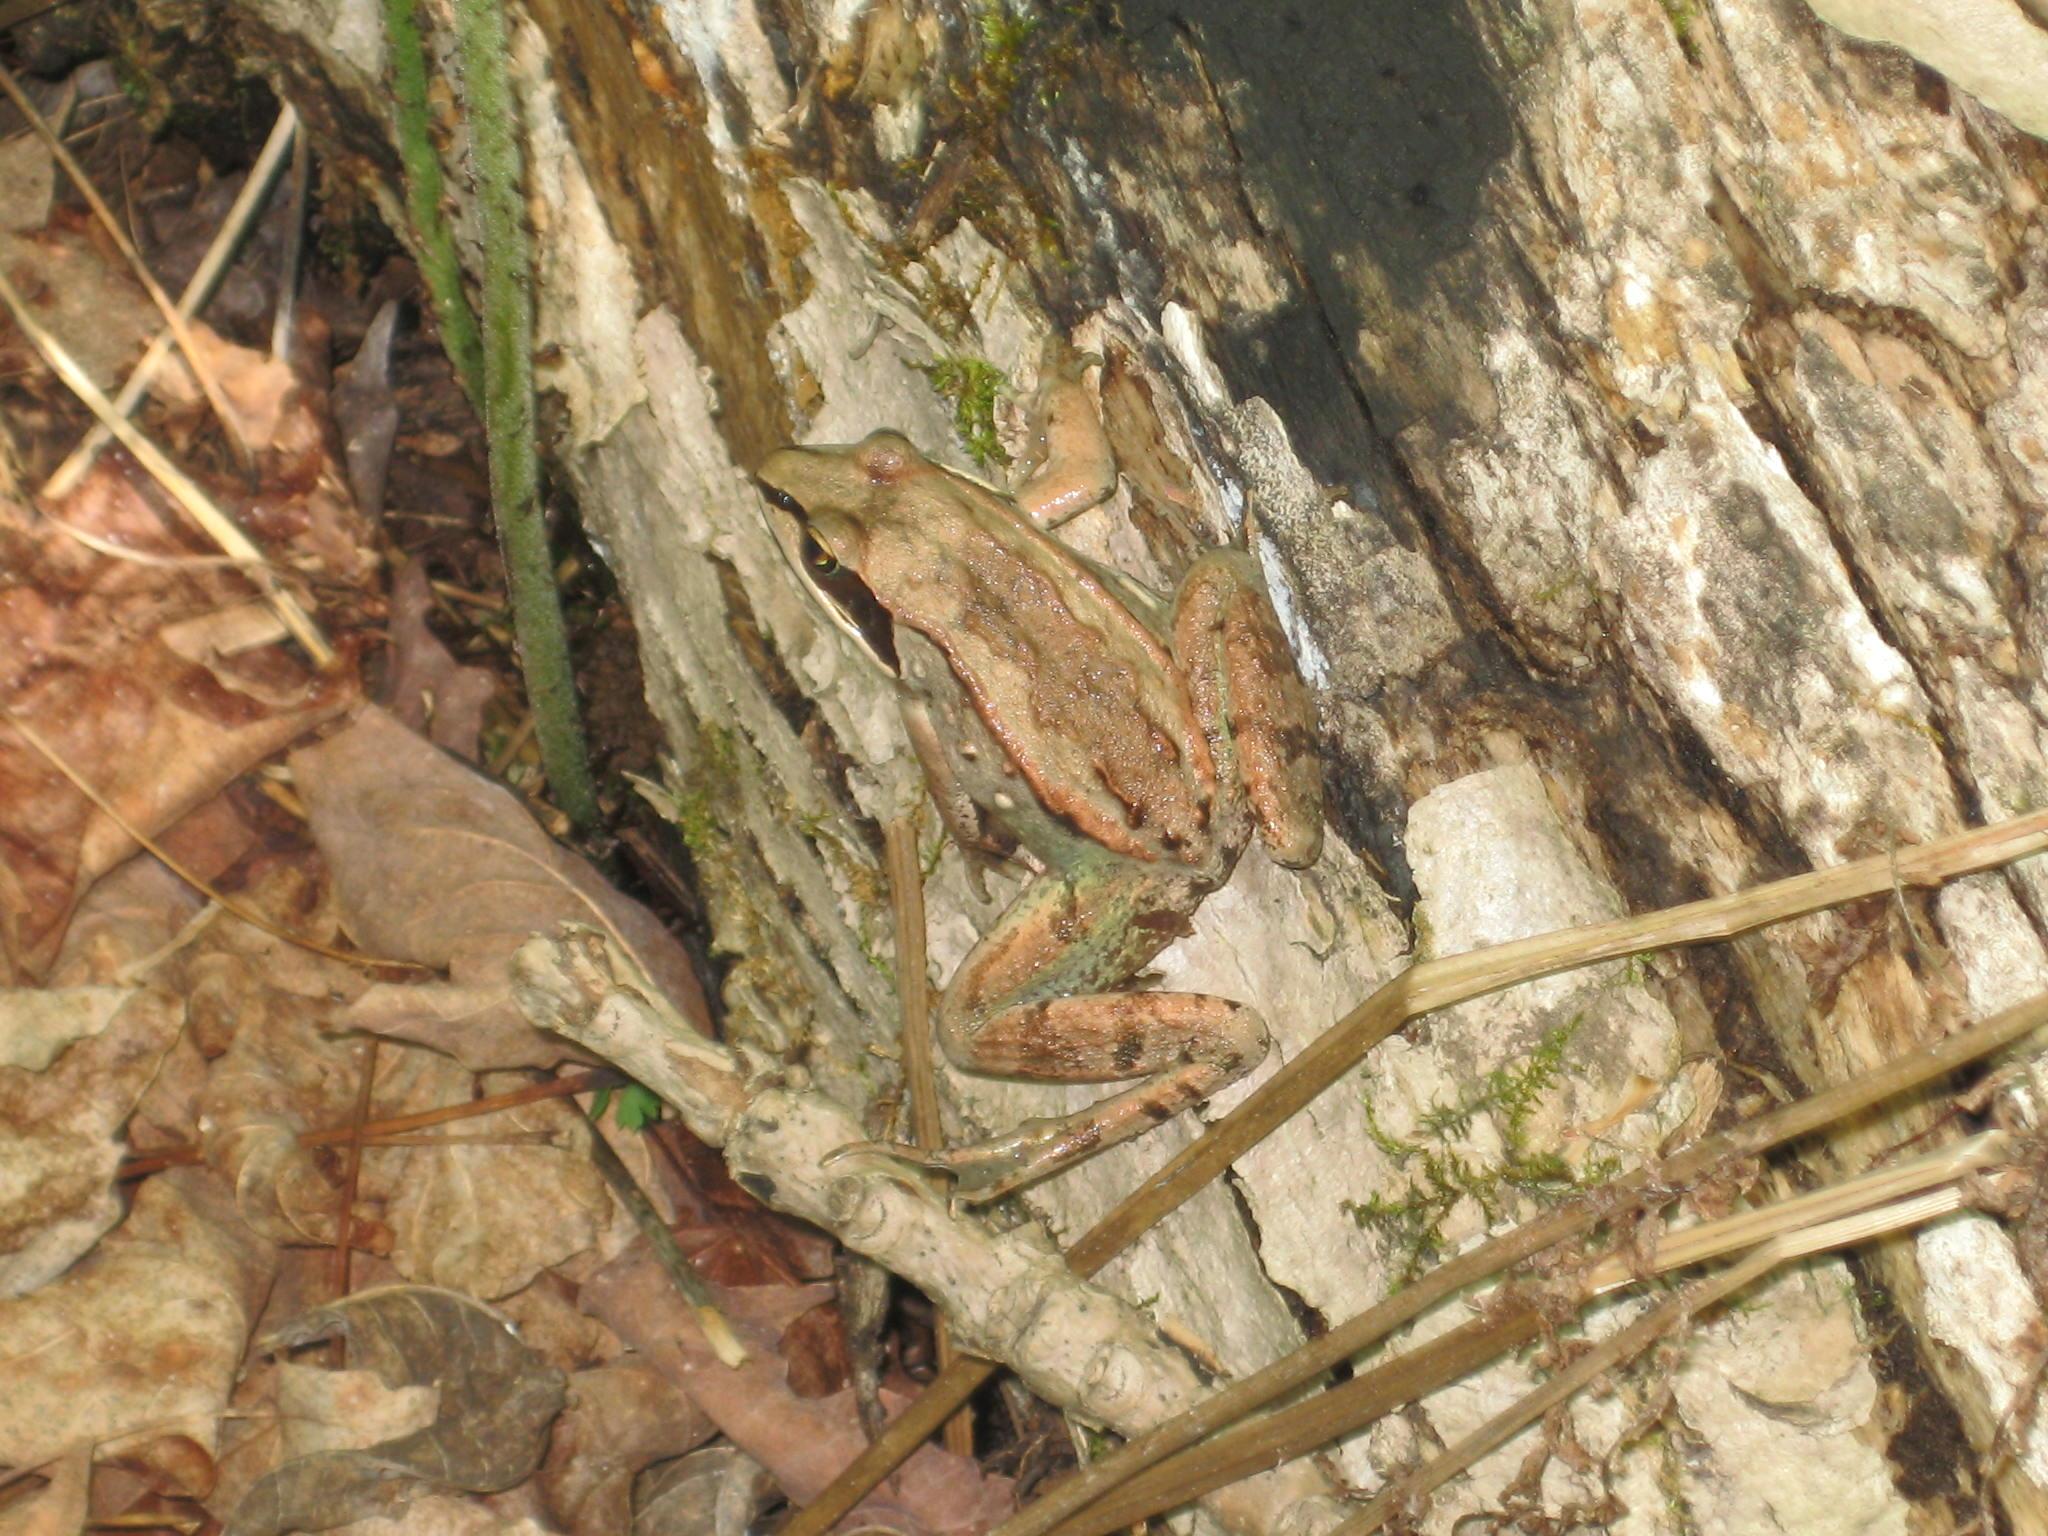 Wood frog, near Lake Superior, Minnesota, 6 June 2014.